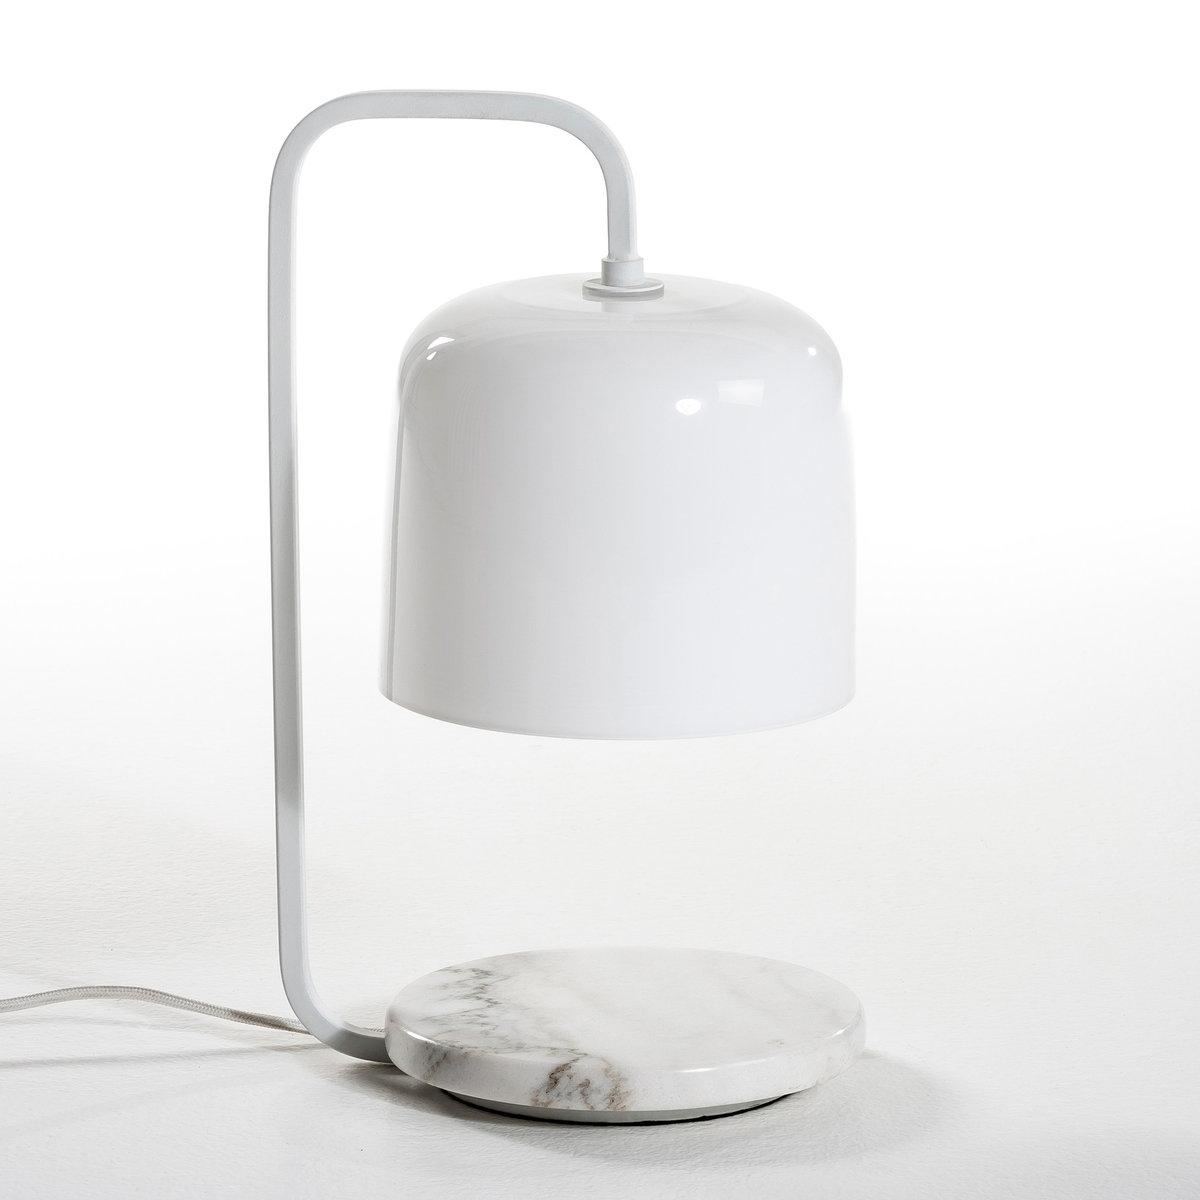 Лампа настольная Zella, дизайн Э. Галлины от La Redoute